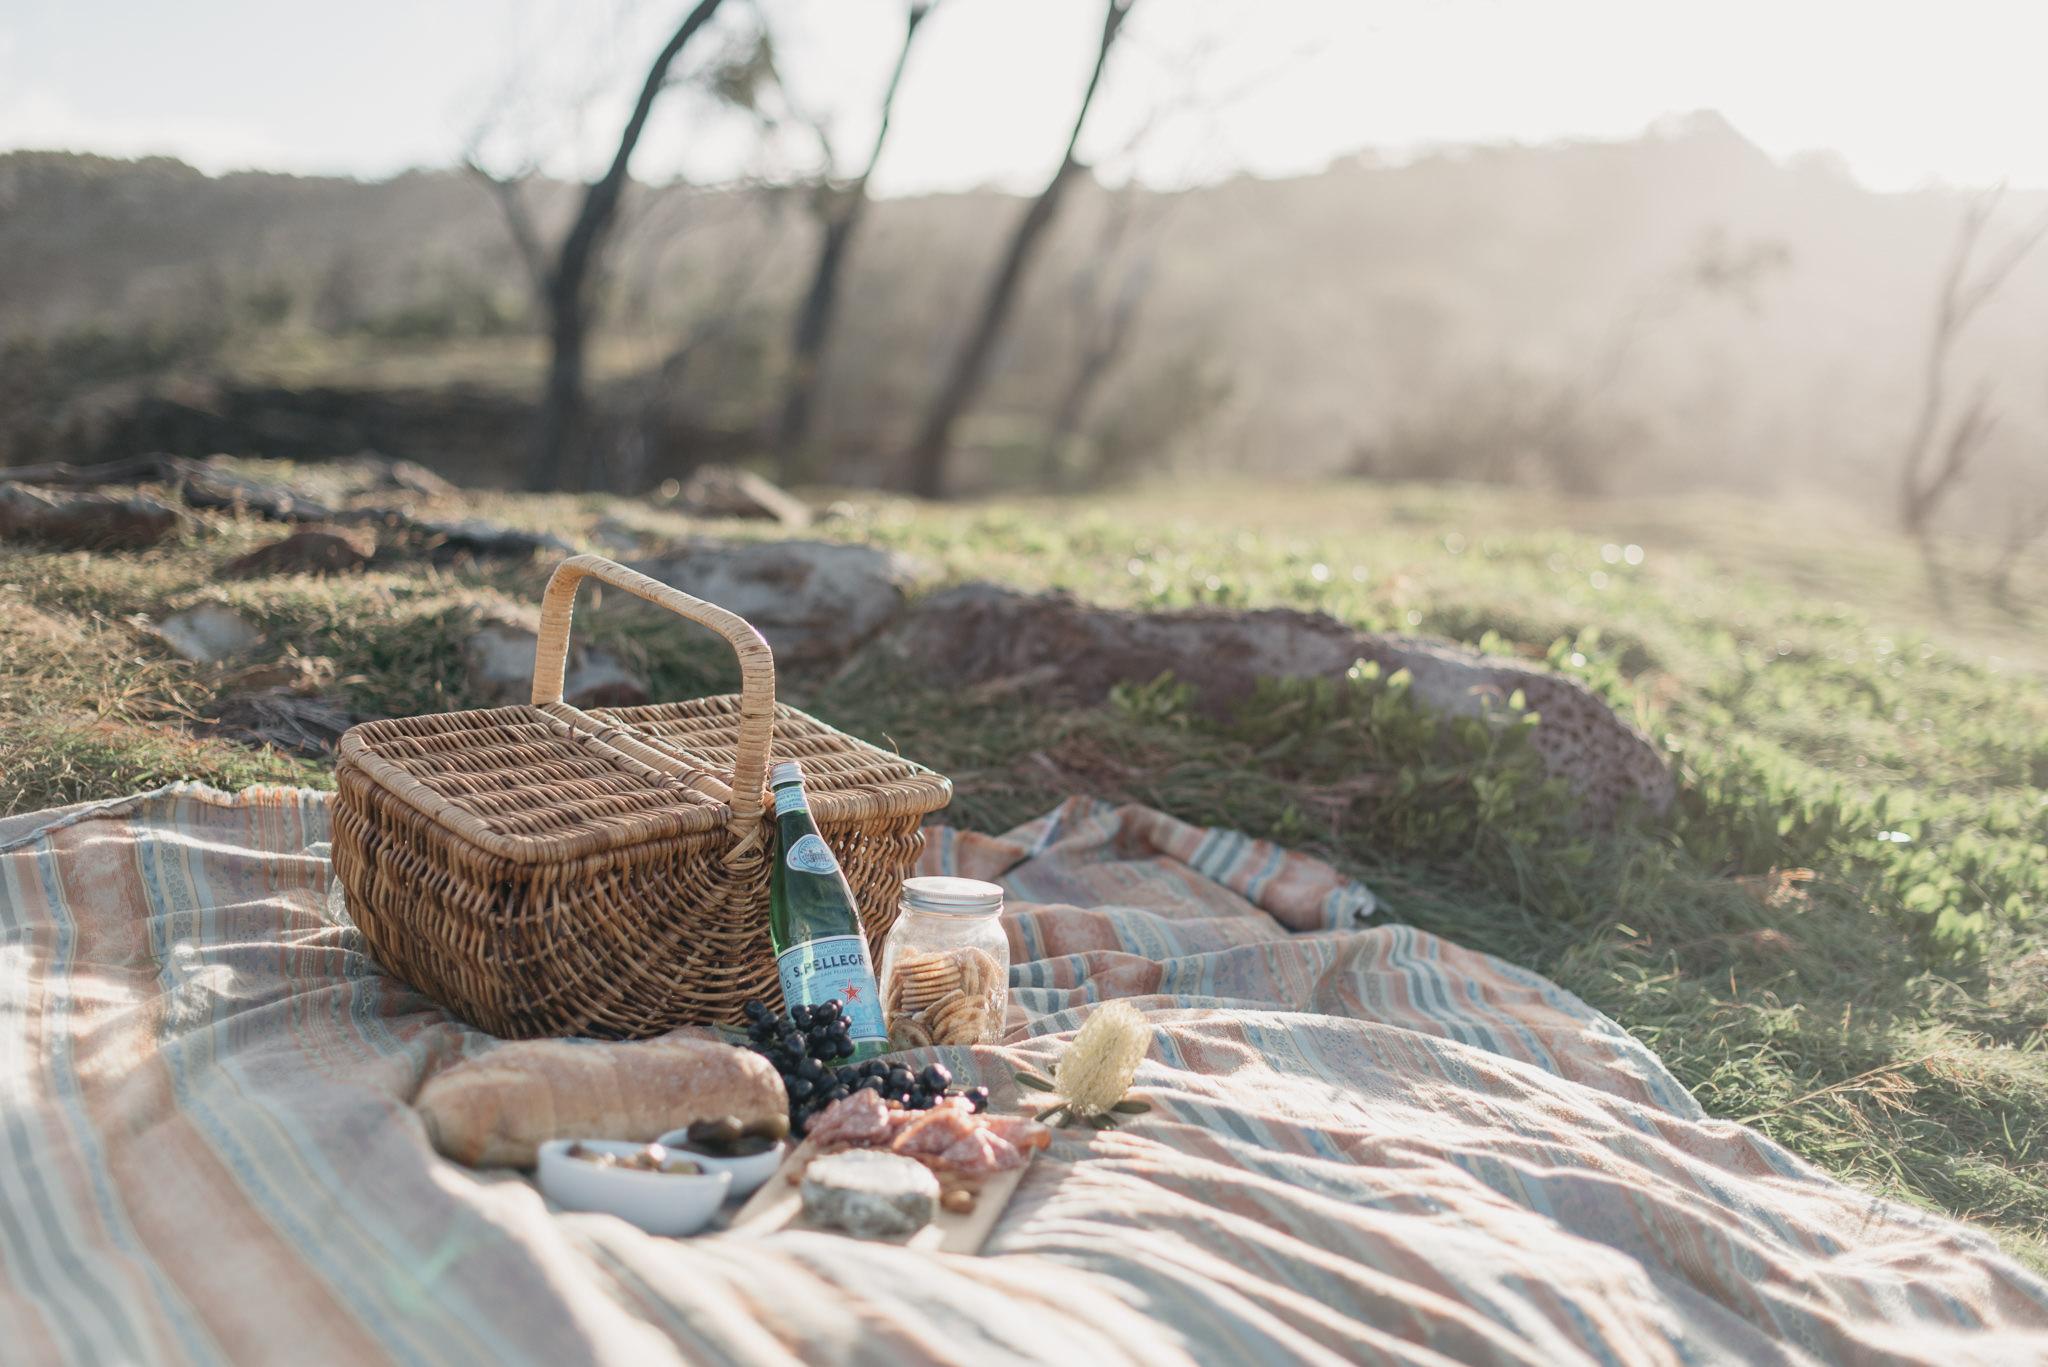 180408 - noosa picnic-6.jpg